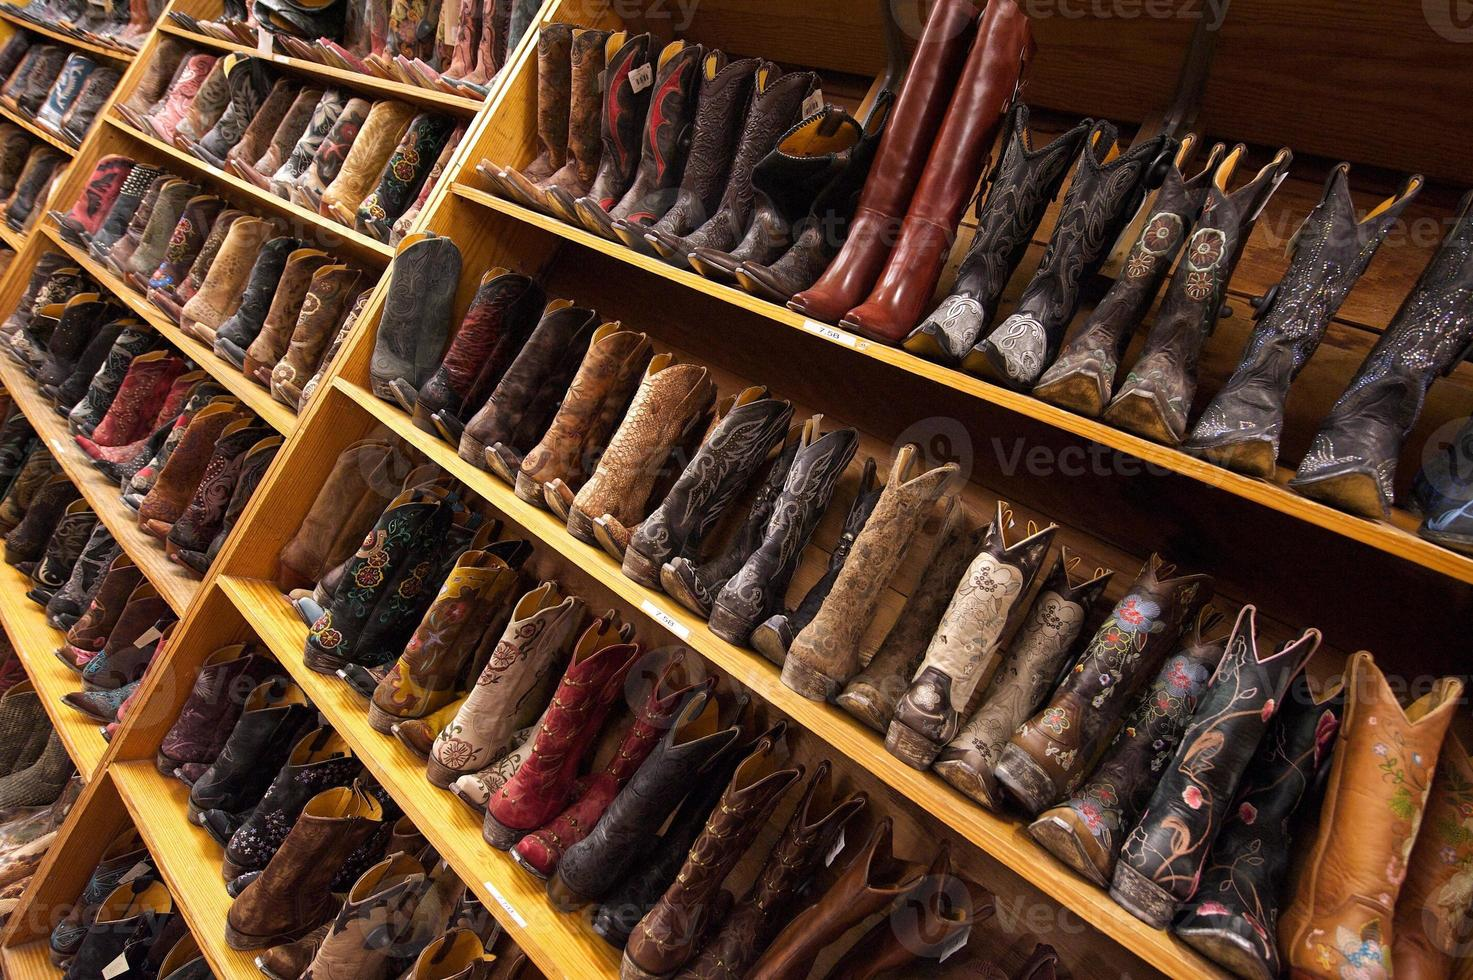 stivali da cowboy da donna allineati sugli scaffali, austin, tx, noi foto